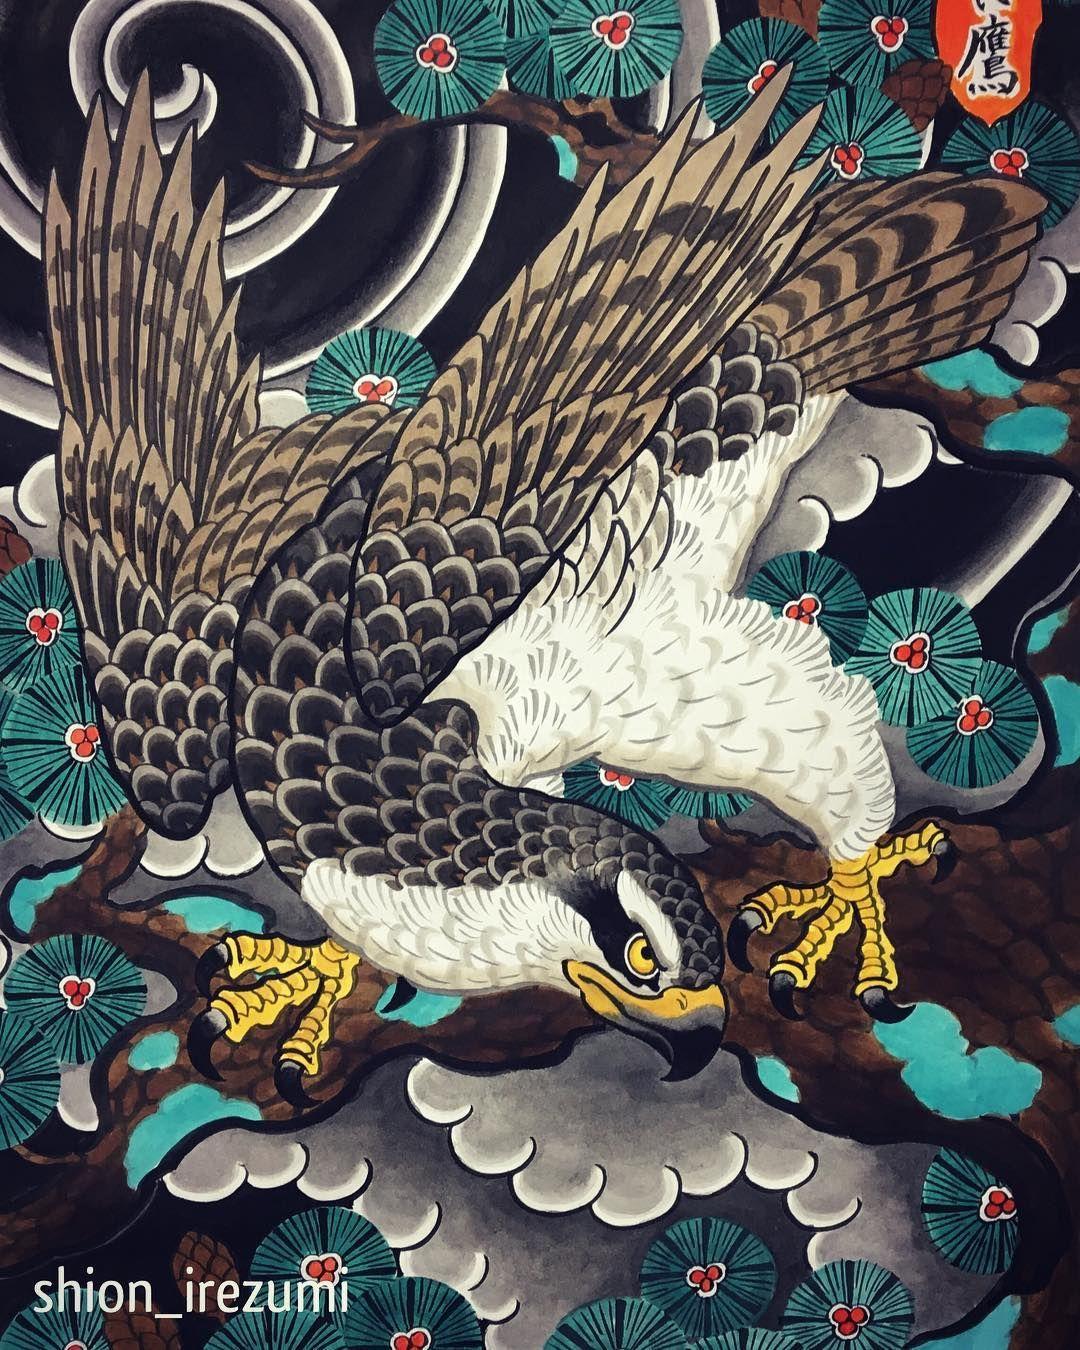 artist shion japan art japanese tattoo art, traditional😊original idea for back piece horishio japanesetattoo irezumi eagle neck tattoo,